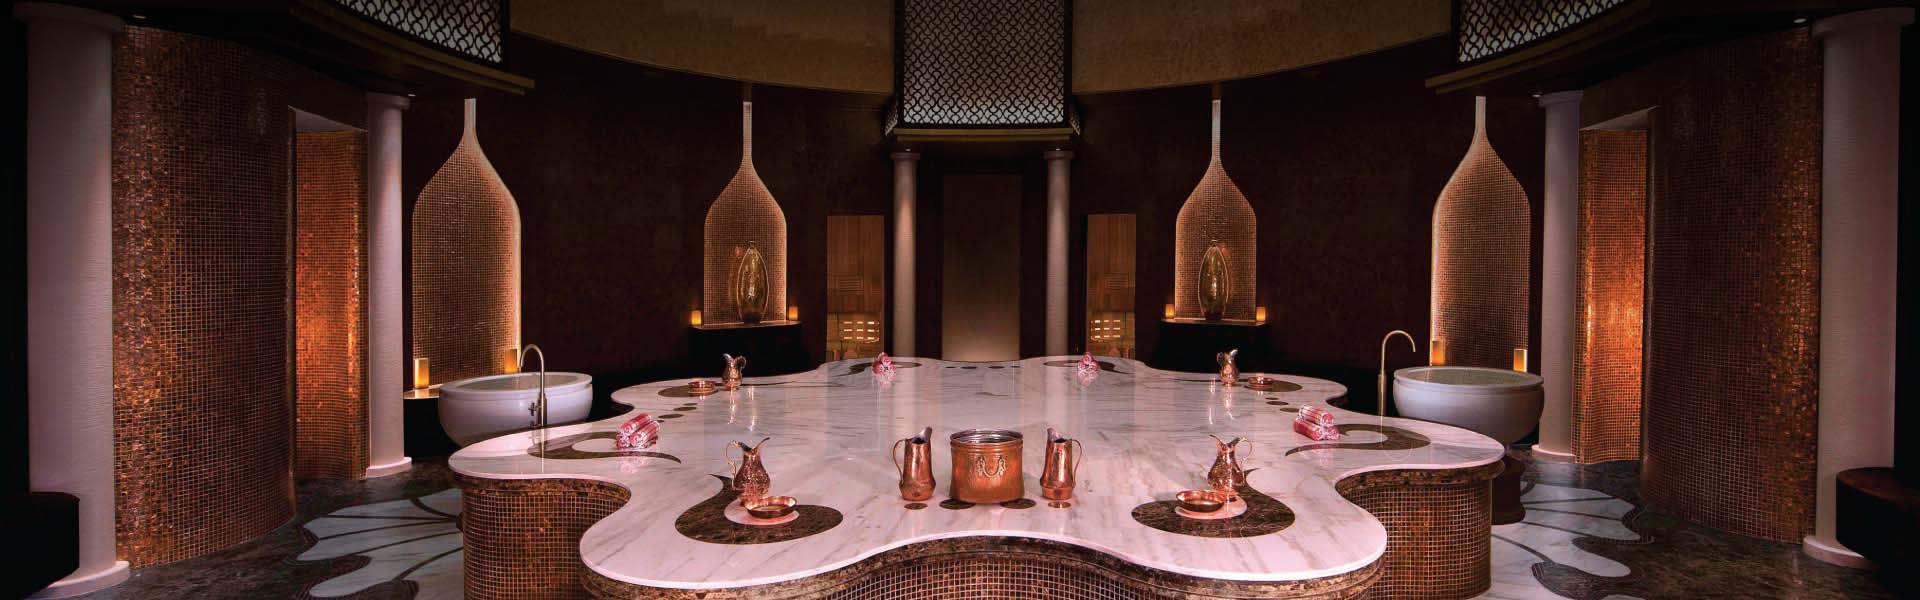 Abu Dhabi Spa Hotel | Eastern Mangroves Hotel | Abu Dhabi Spa Hotel